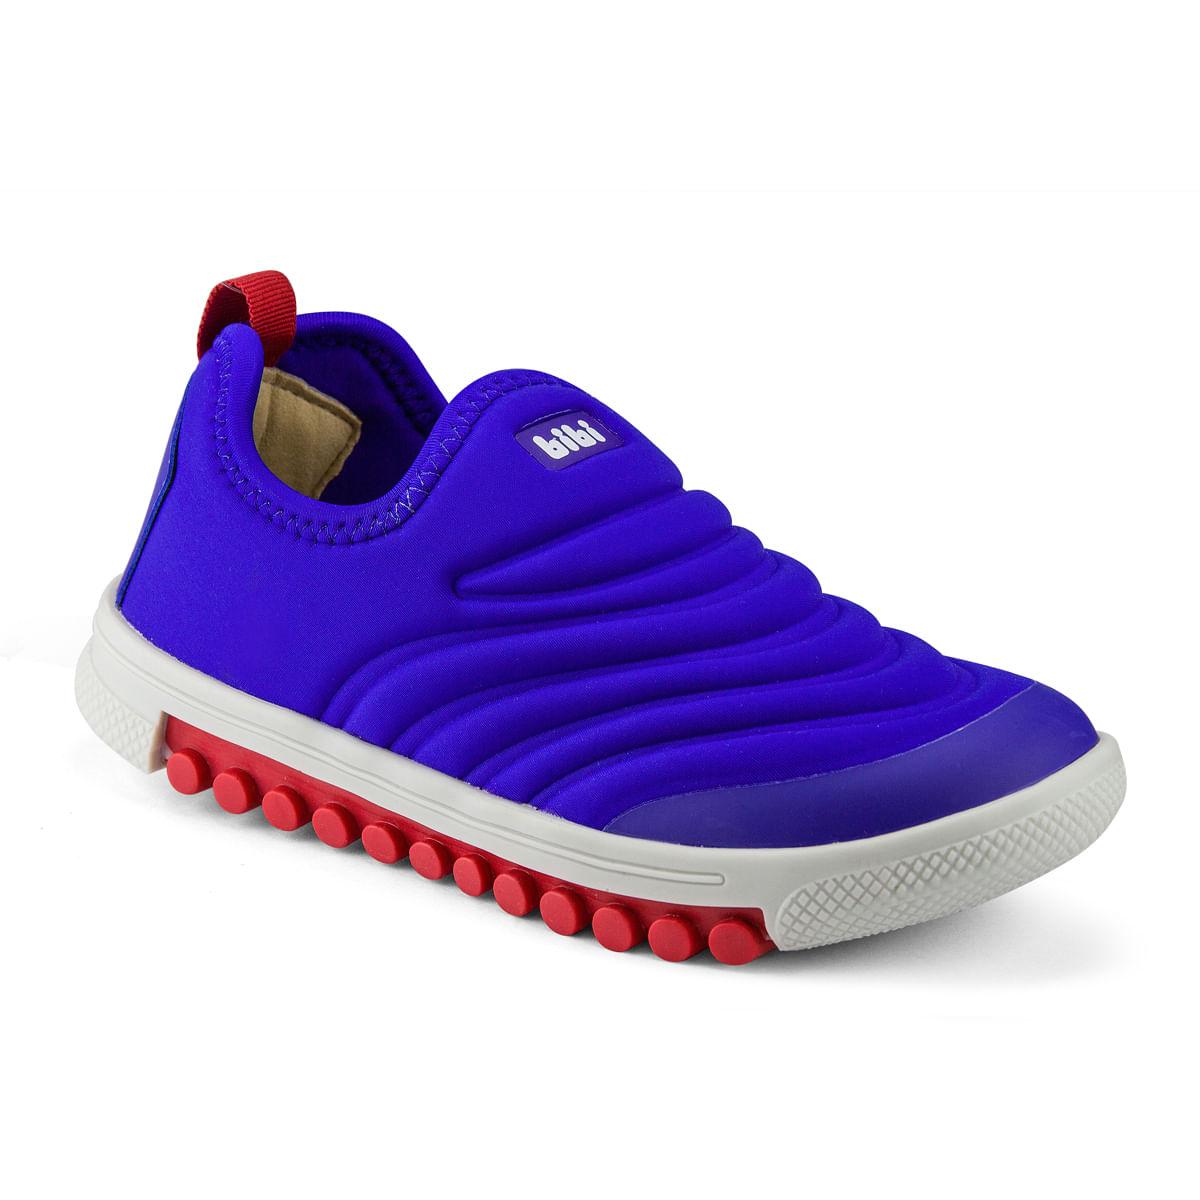 914eb2cf1be Tênis Infantil Bibi Masculino Azul Roller New 679489 - Bibi Calçados